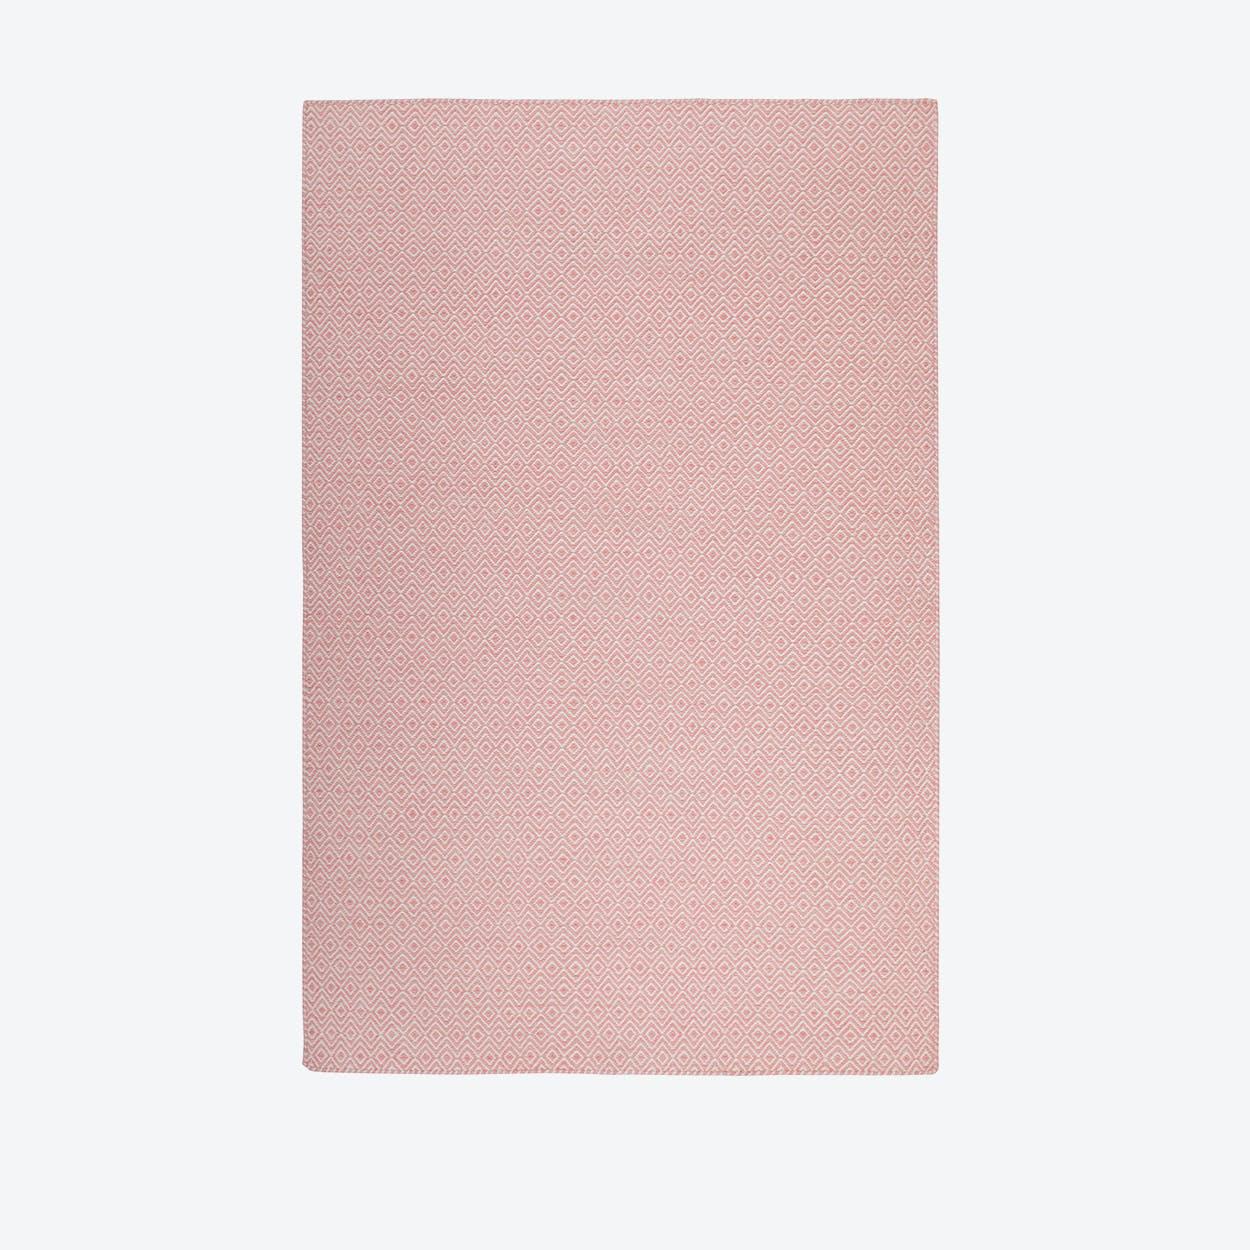 My Jaipur 334 Powder Pink Rug